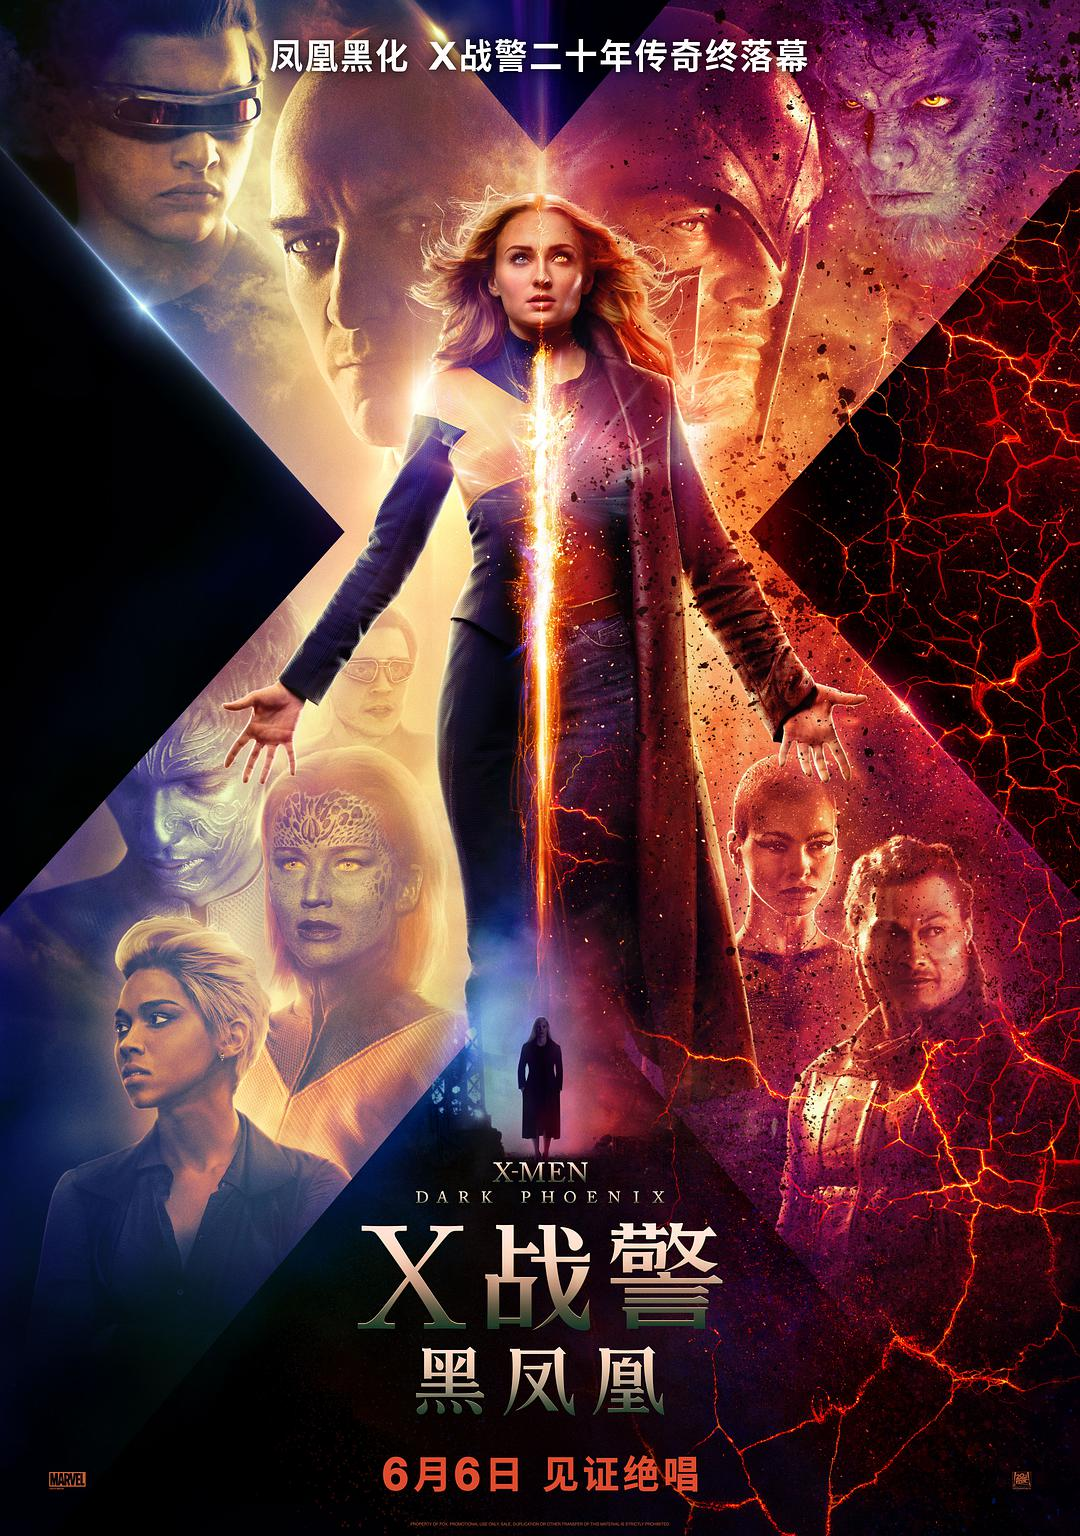 X战警:黑凤凰海报剧照